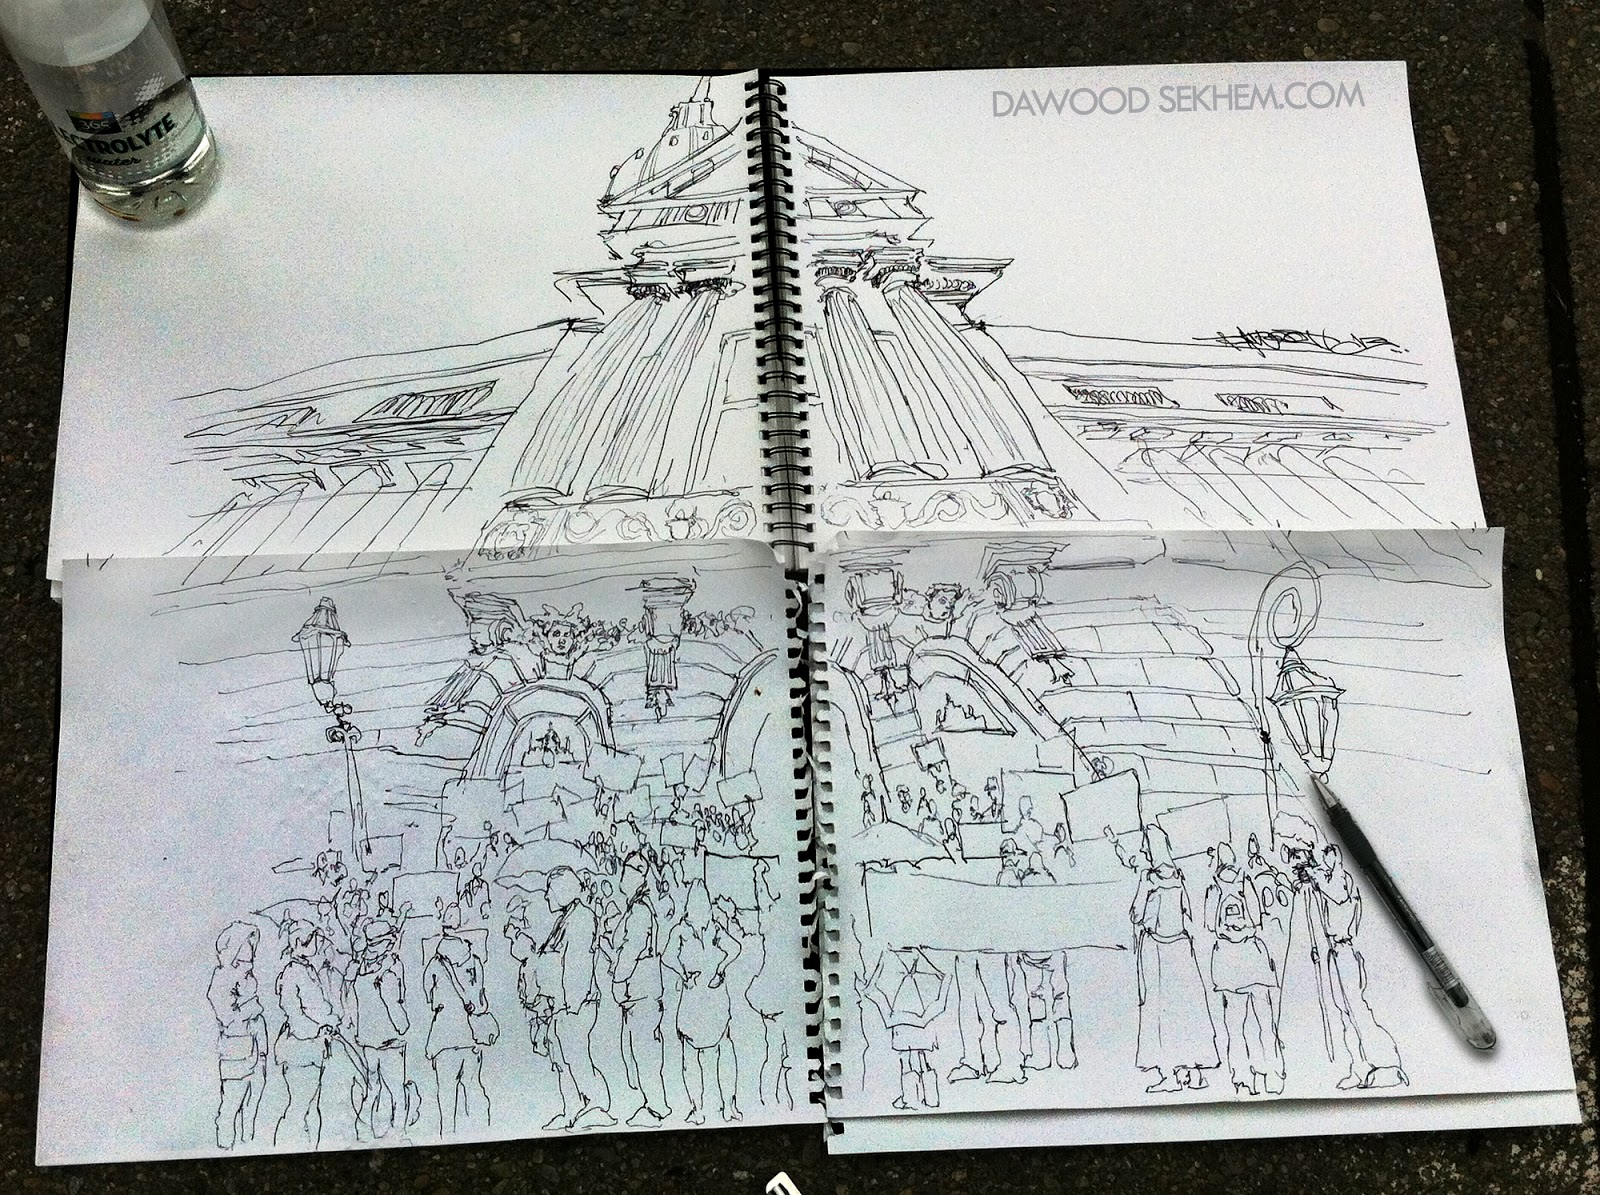 dawood_sekhem_drawing_reportage_art001.jpg